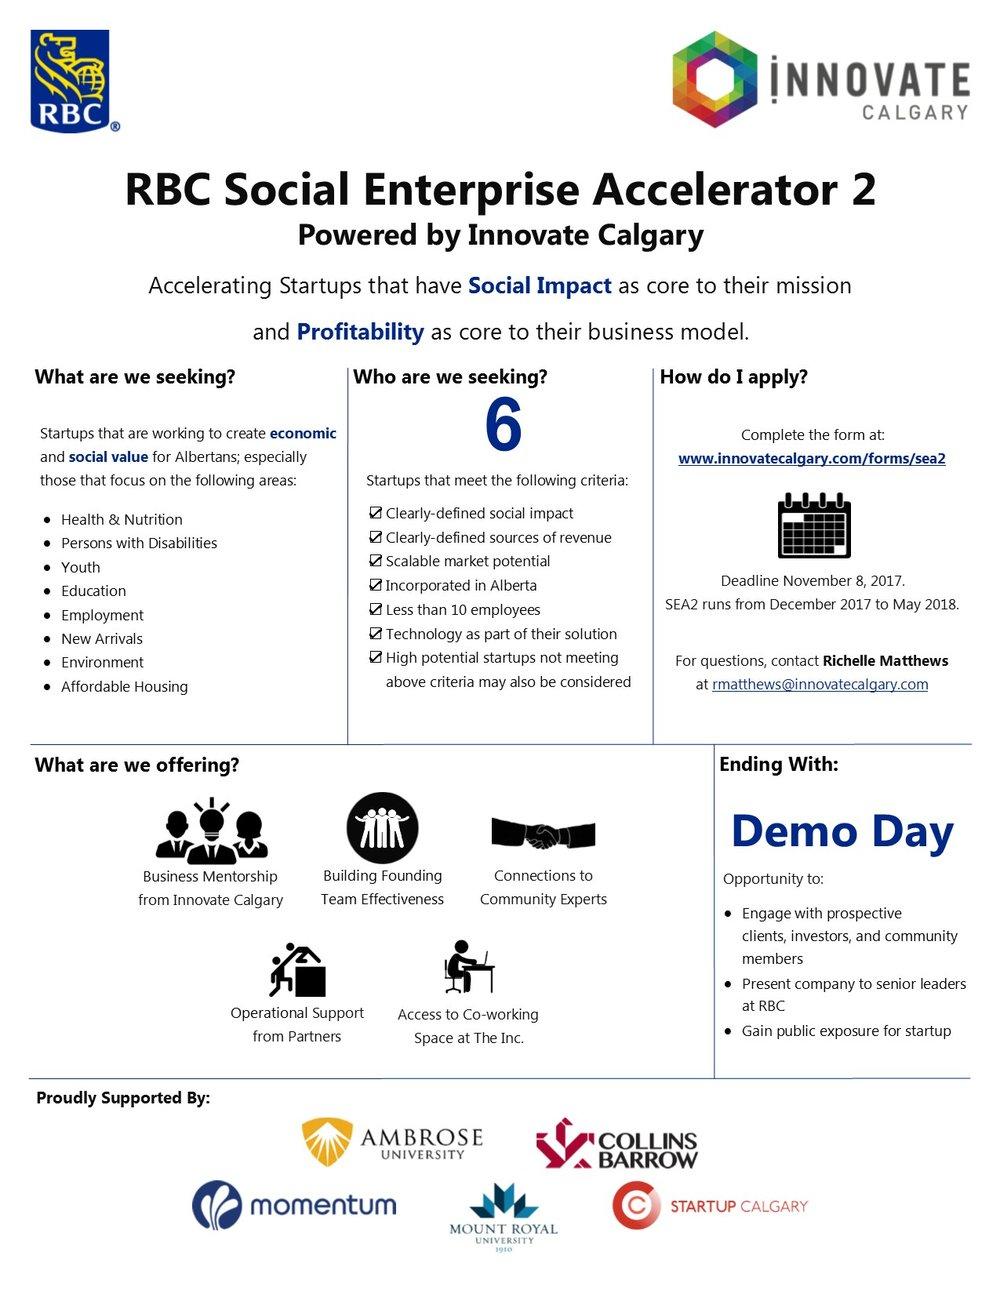 RBC Social Enterprise Accelerator 2017-18.jpg